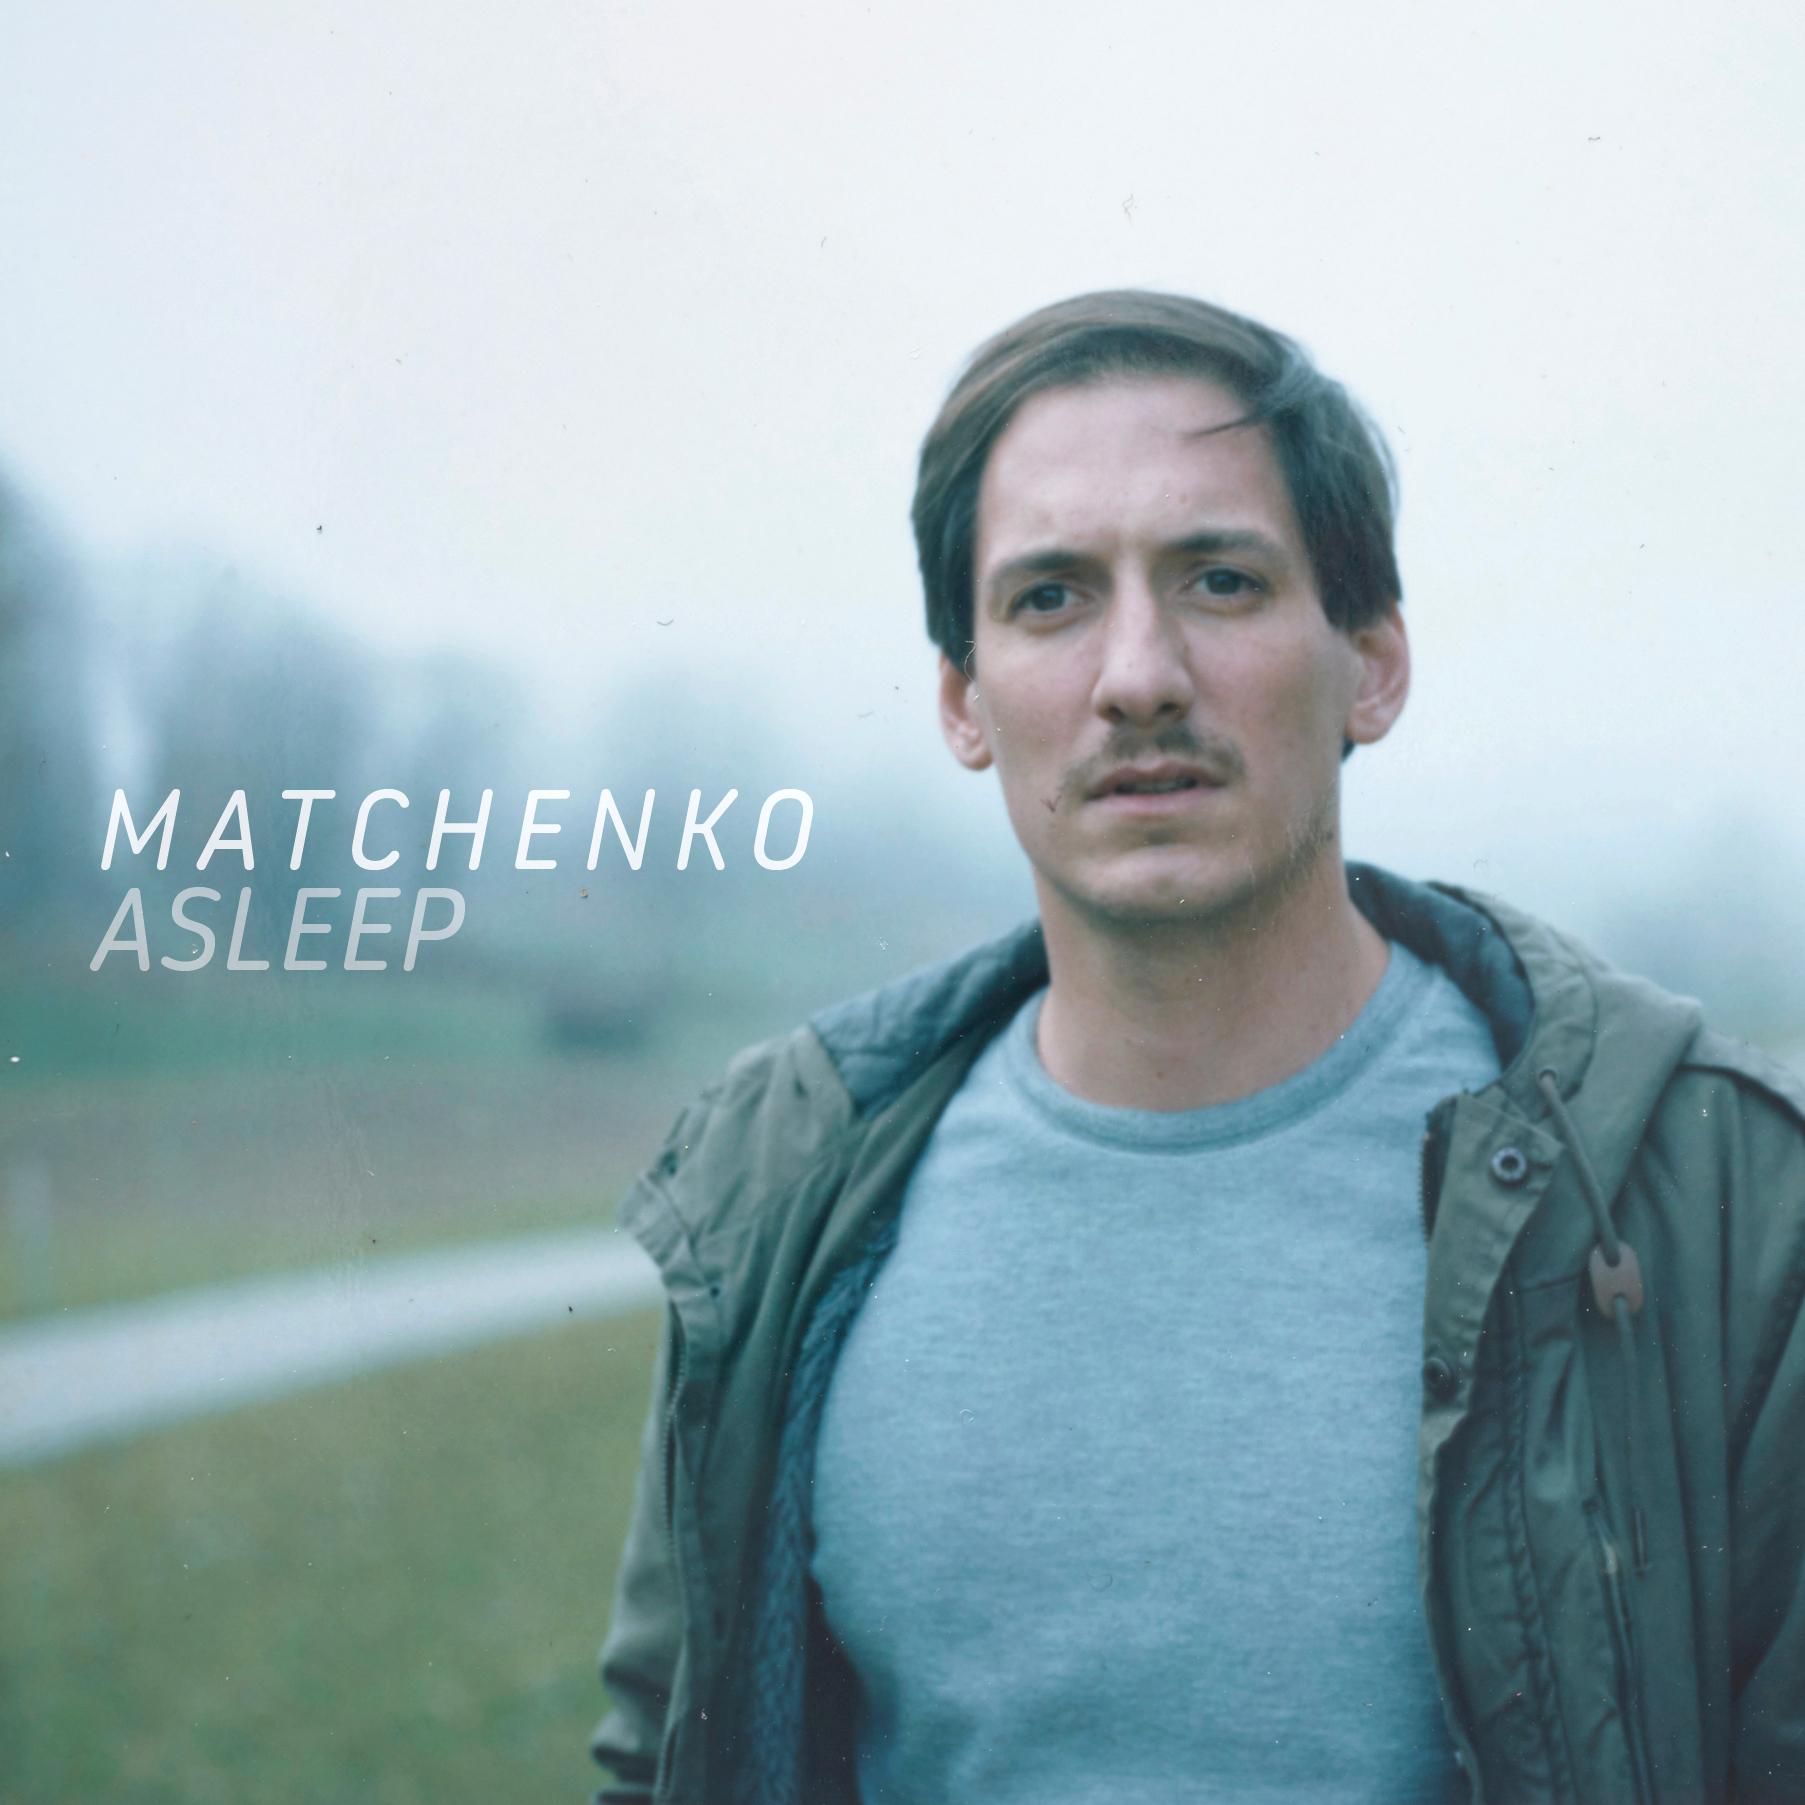 Matchenko